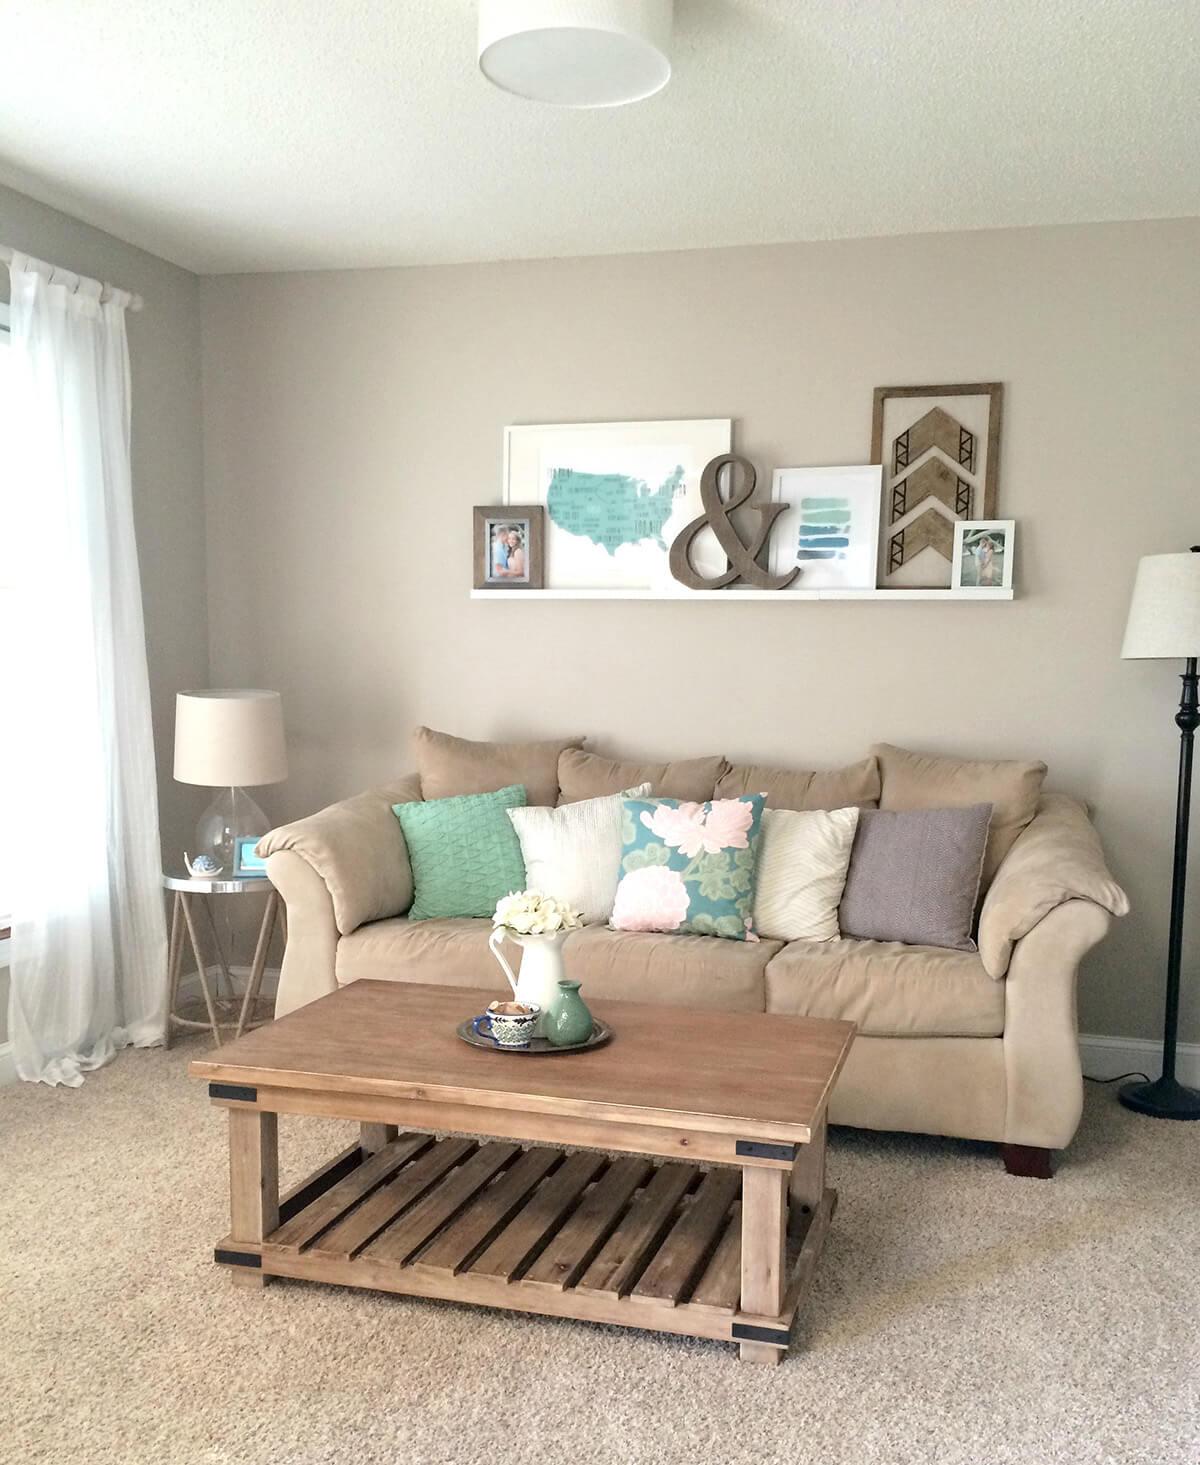 Beige litet vardagsrum.  Källa: Homebnc.com